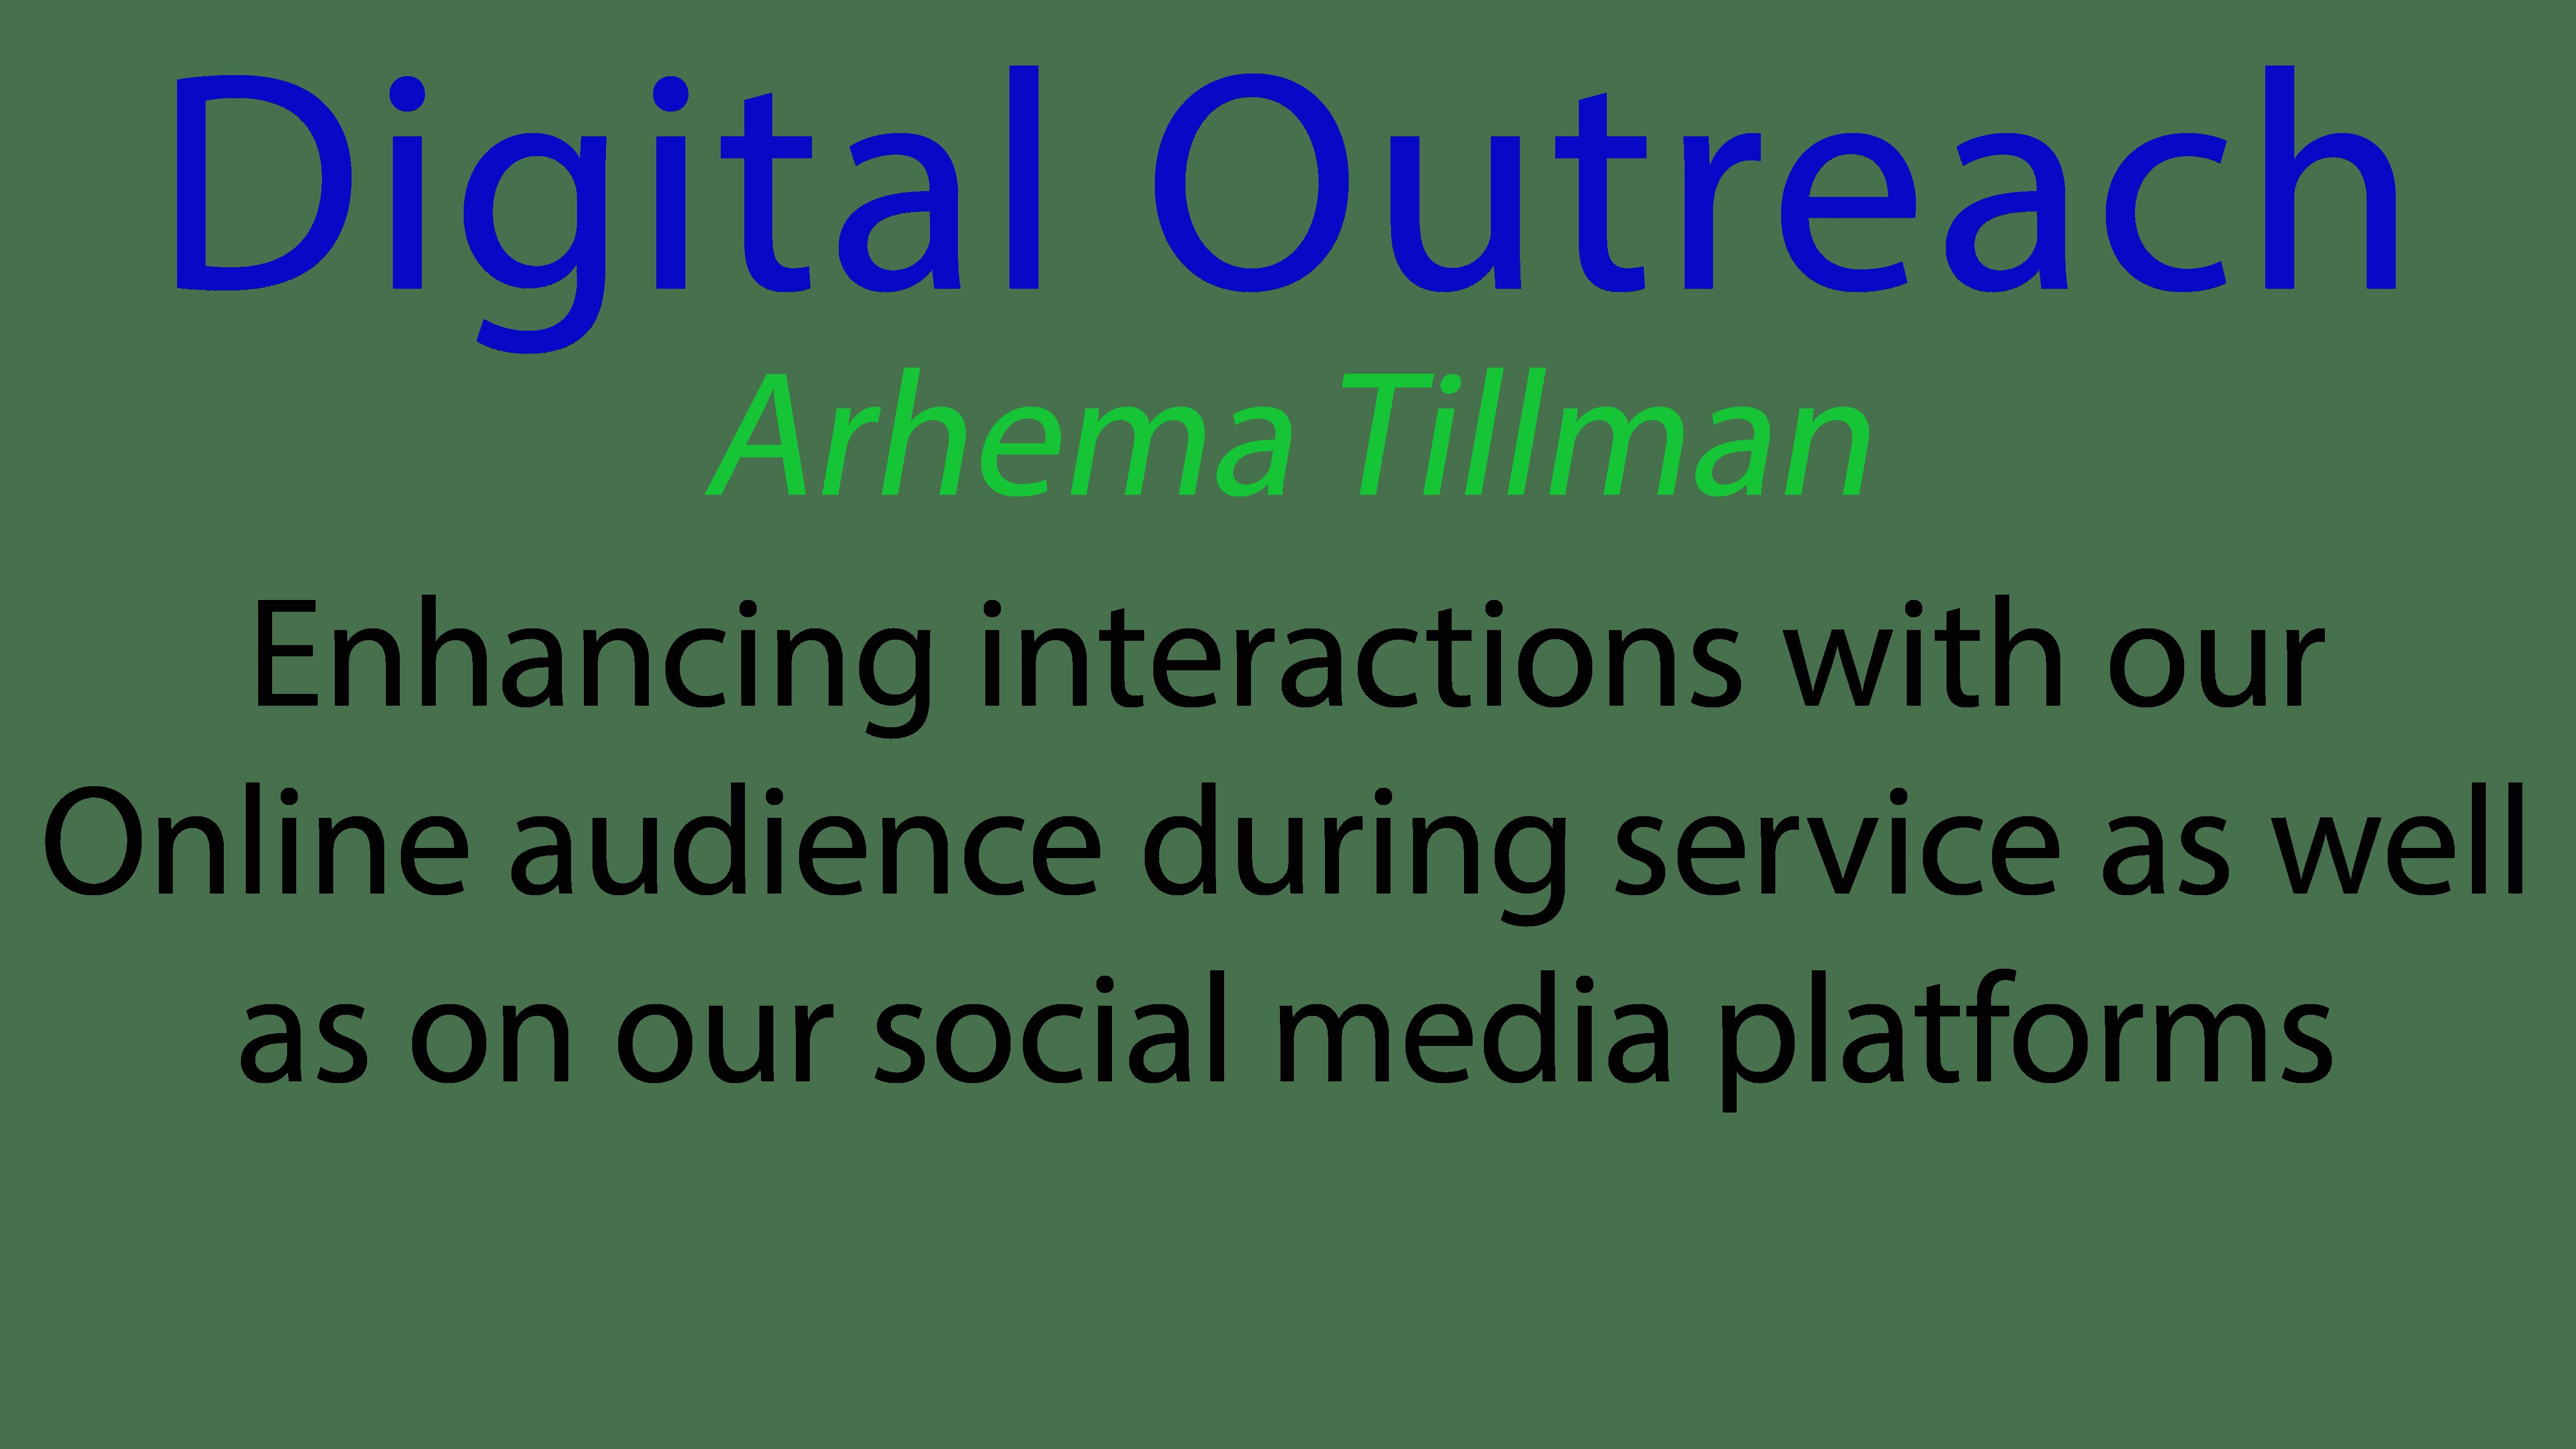 Digital Outreach